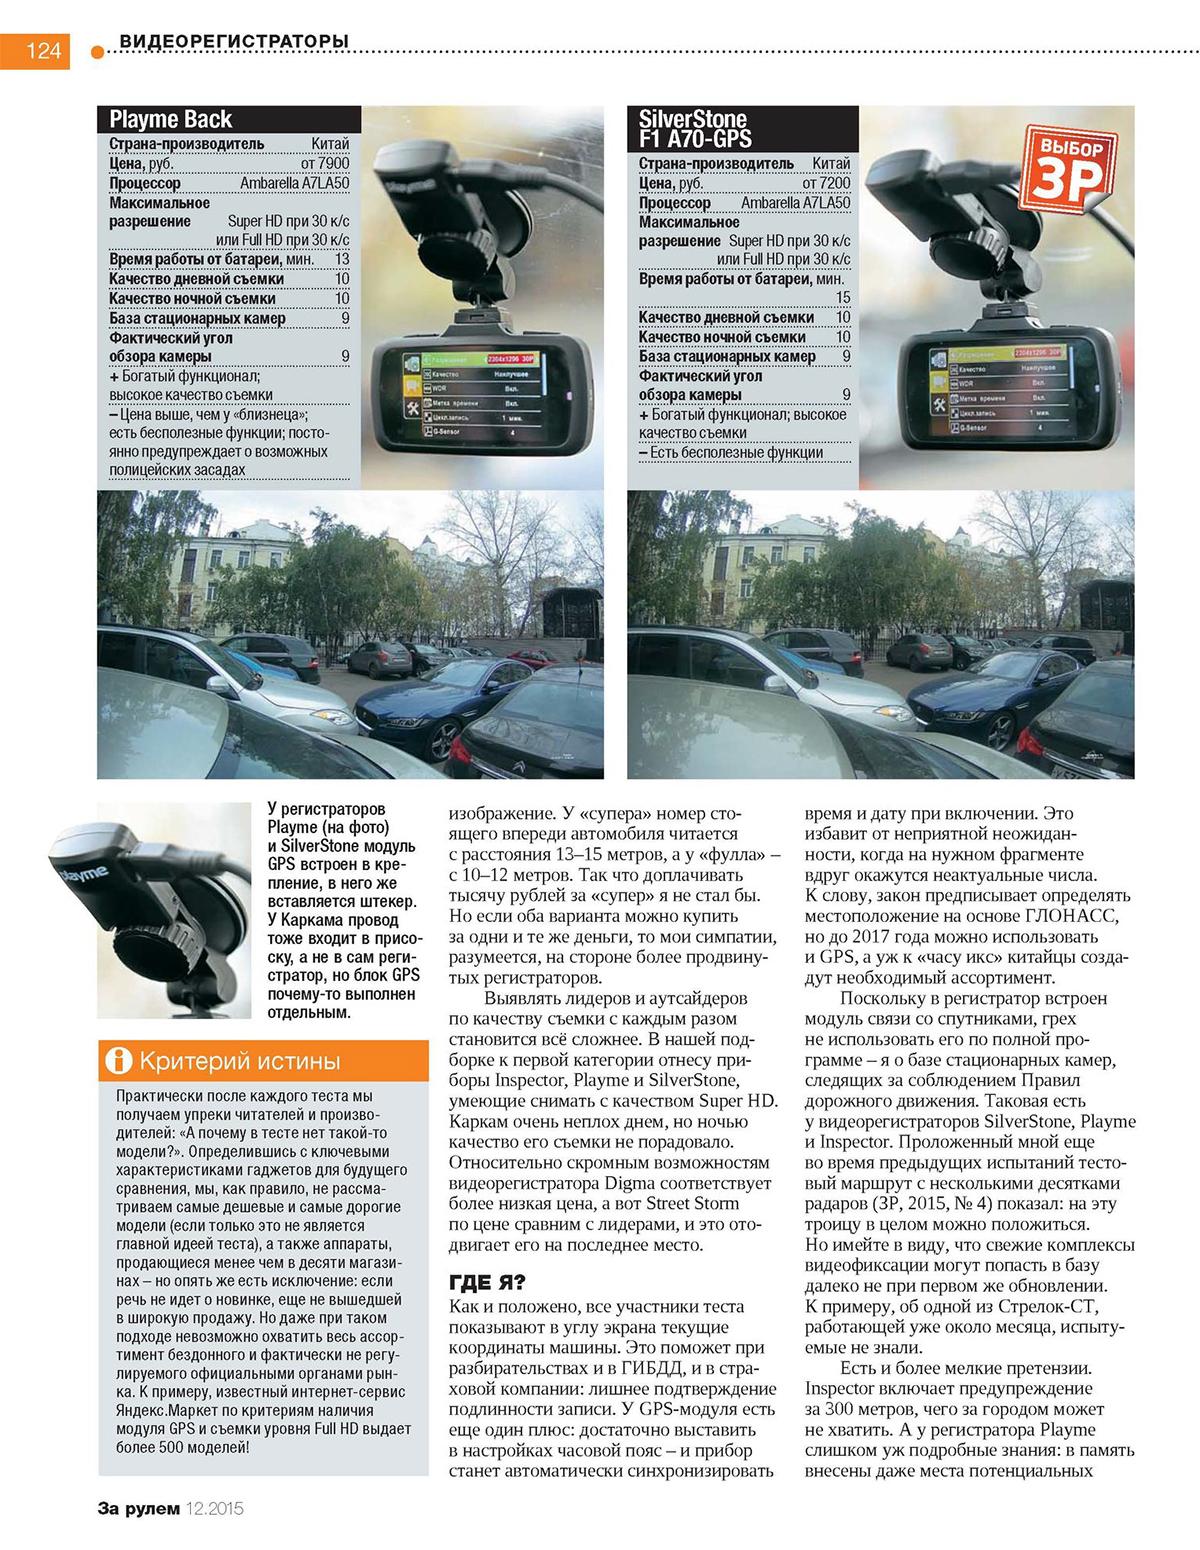 Журнал за рулем видеорегистратор